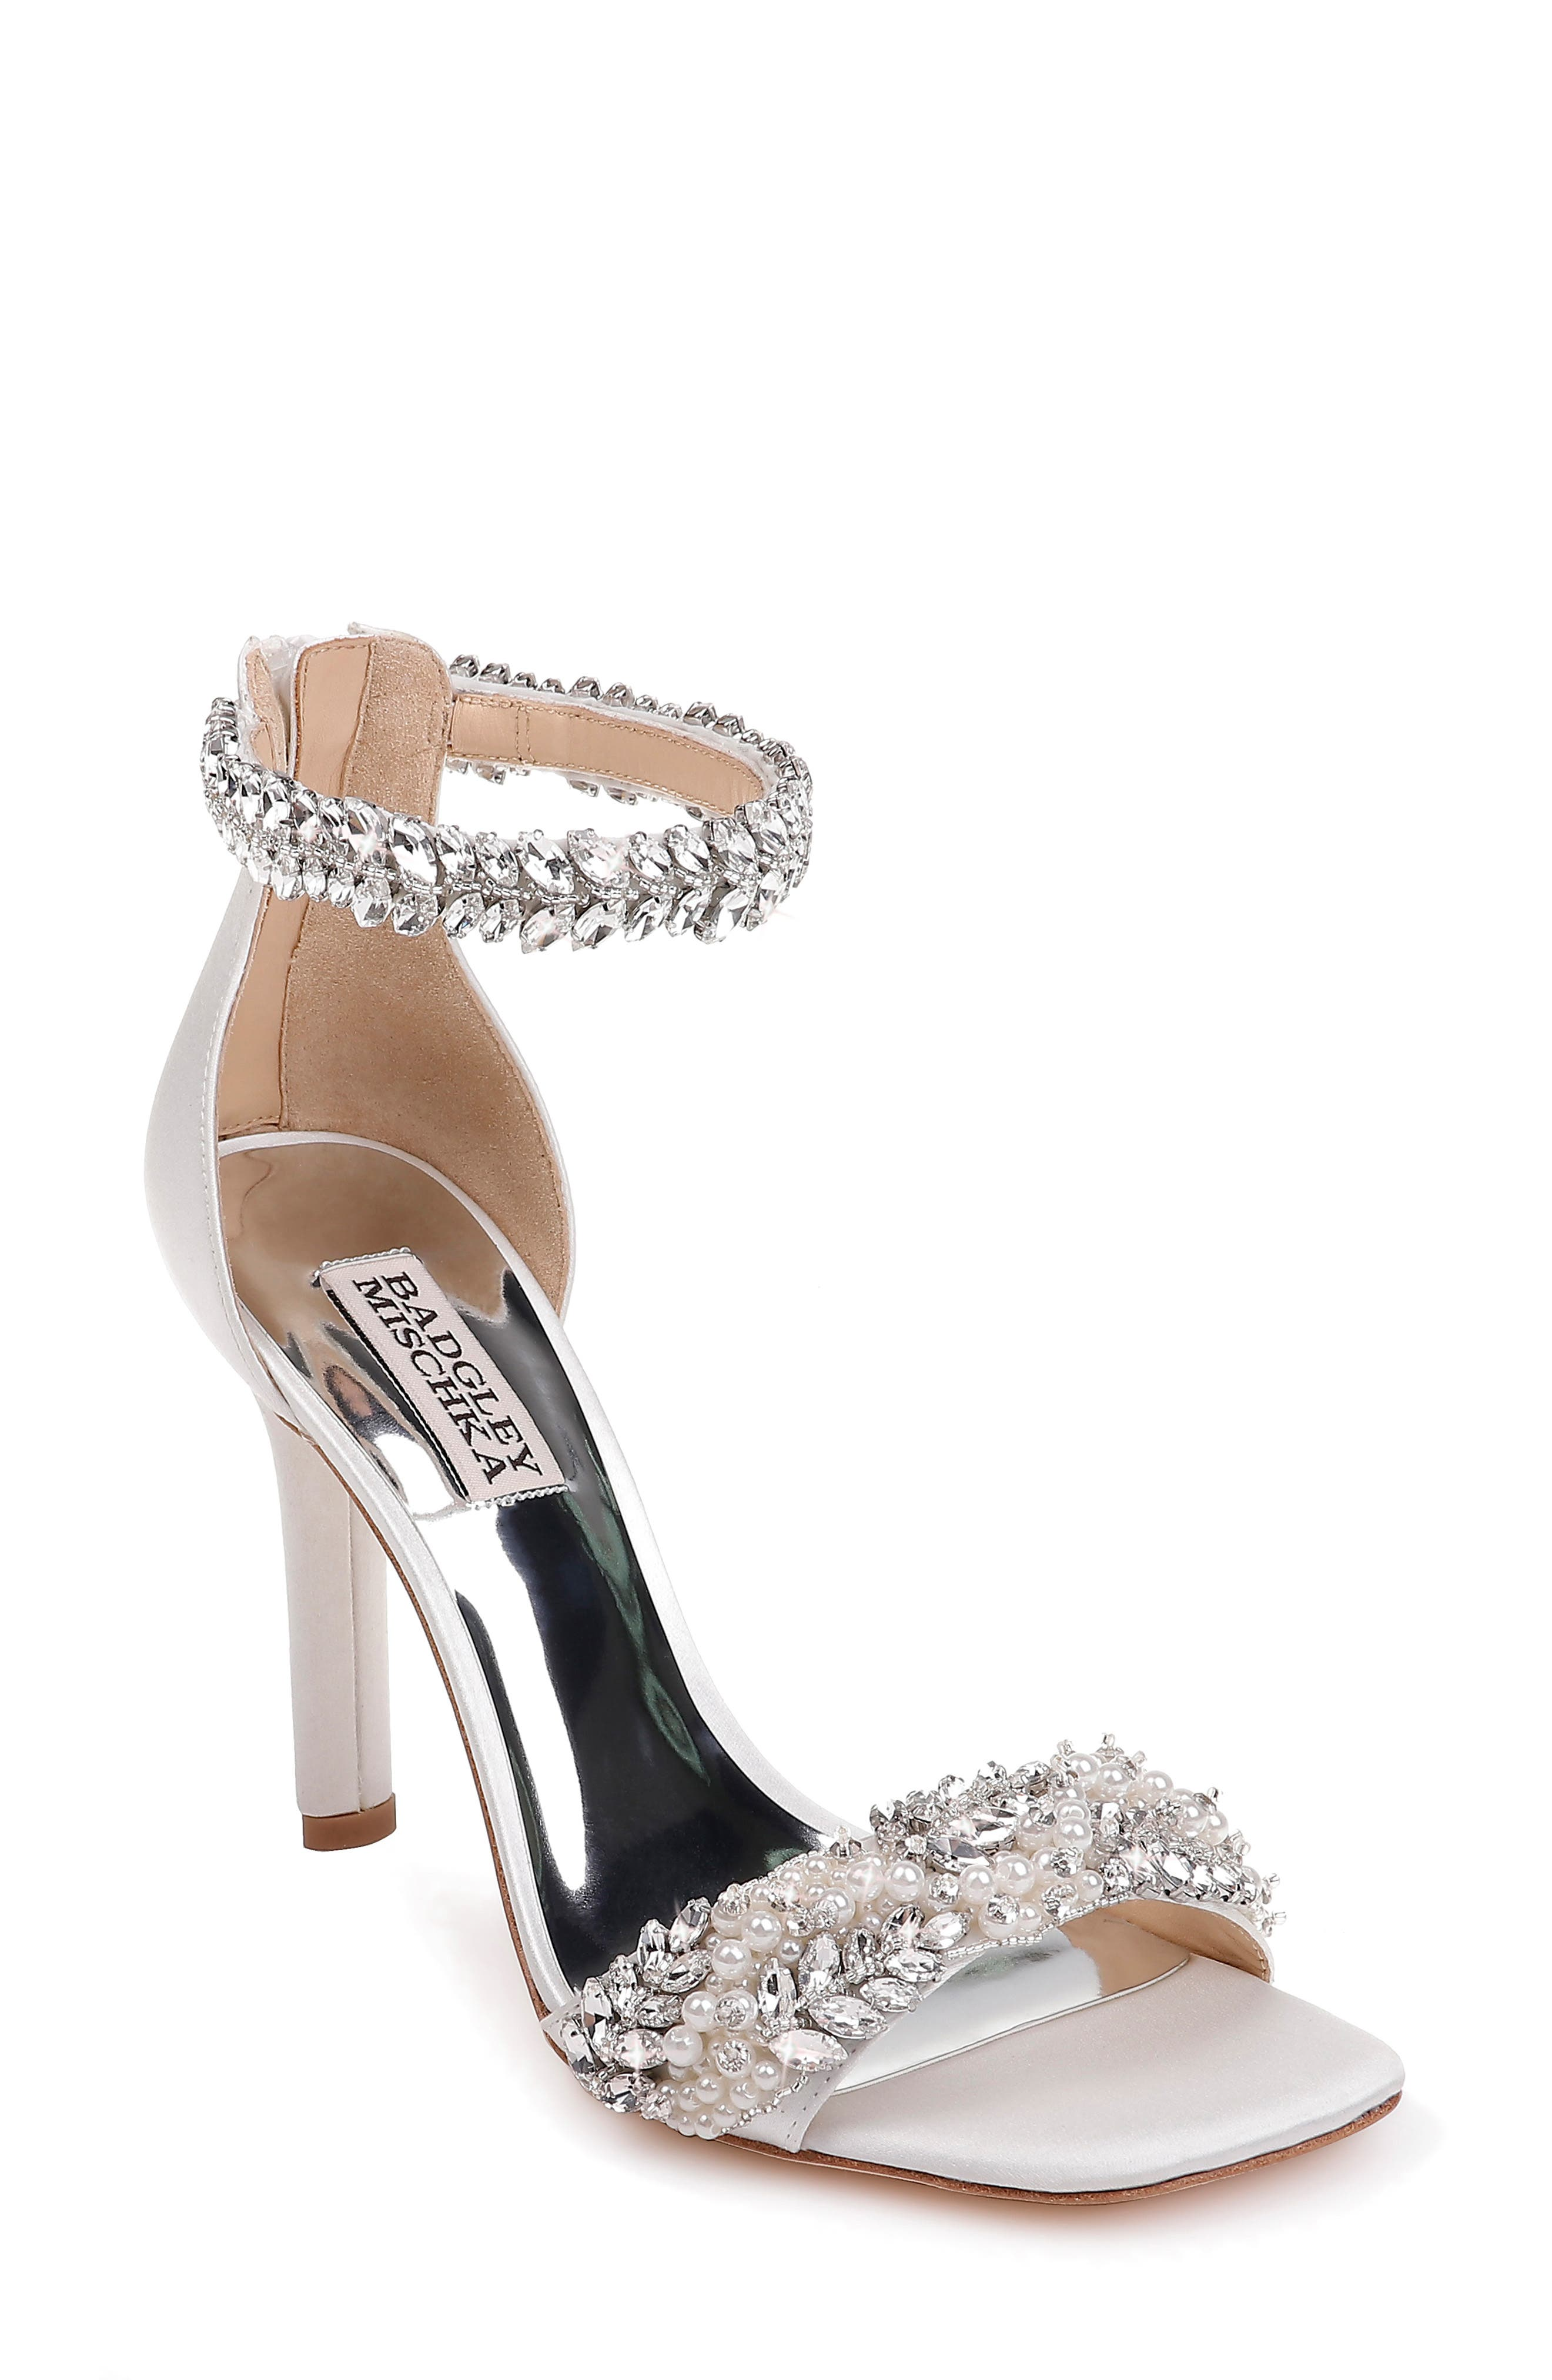 BADGLEY MISCHKA COLLECTION Badgley Mischka Fiorenza Crystal & Imitation Pearl Embellished Sandal, Main, color, SOFT WHITE SATIN